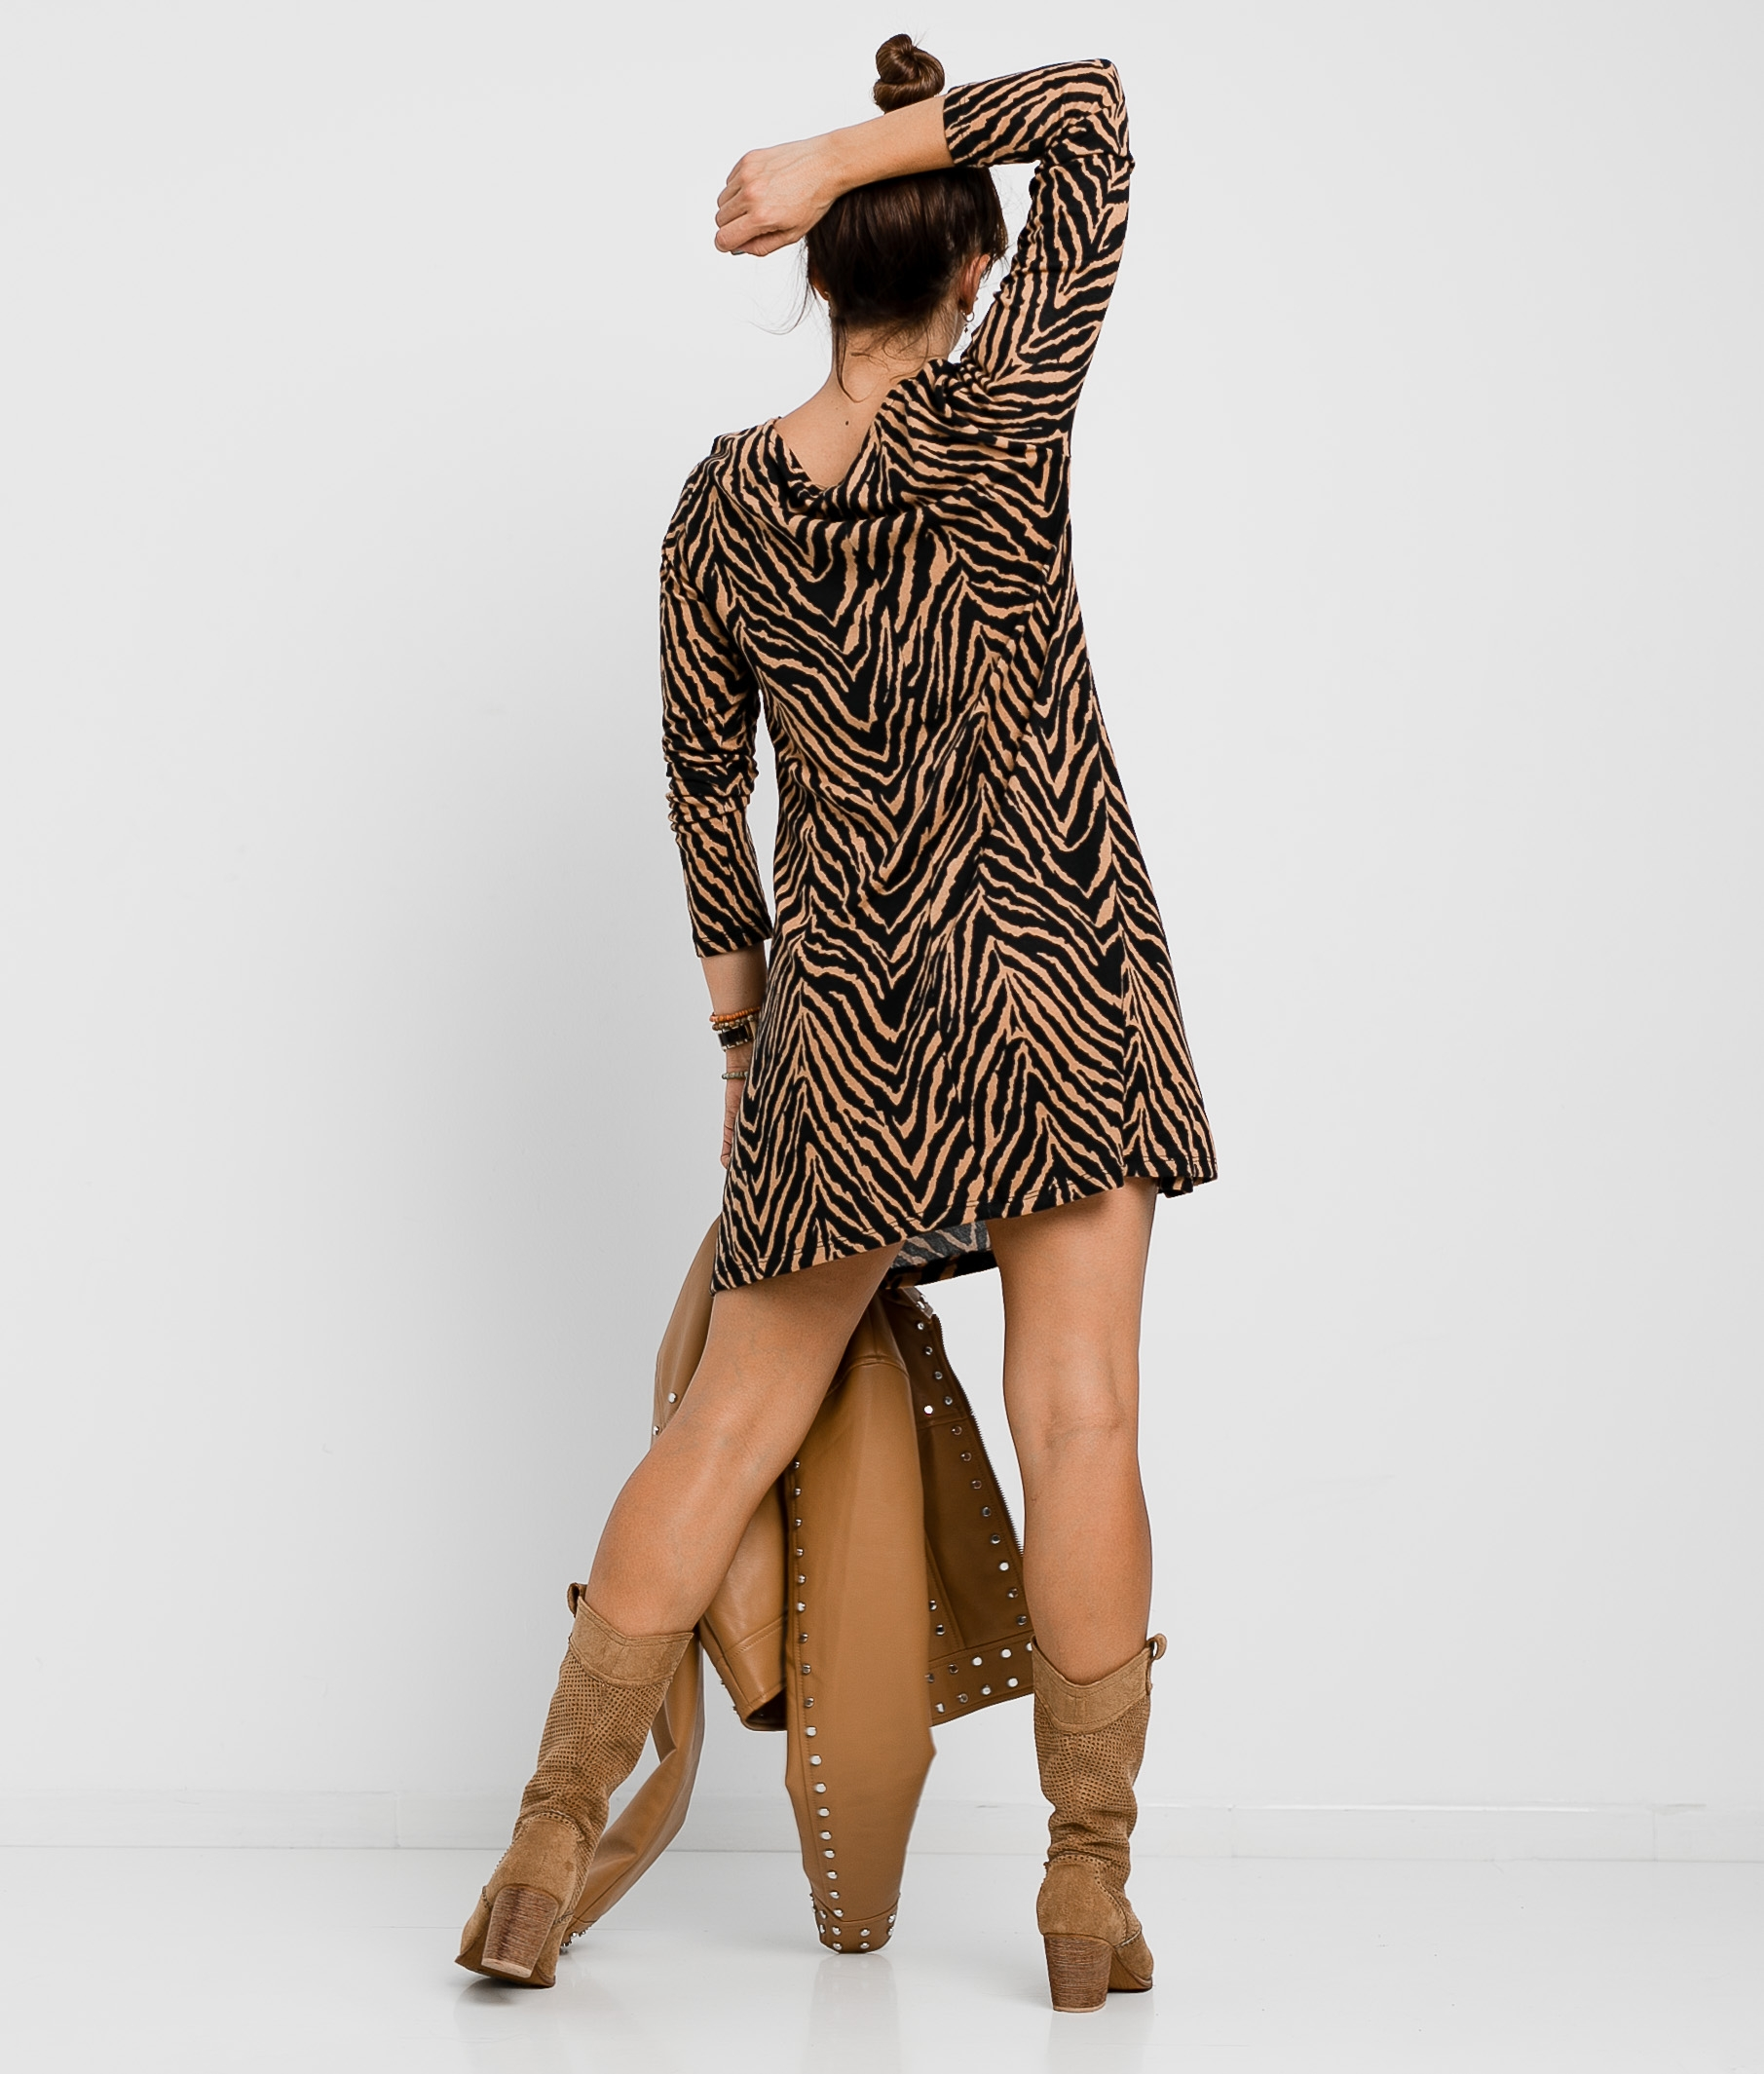 SERSEI DRESS - BROWN